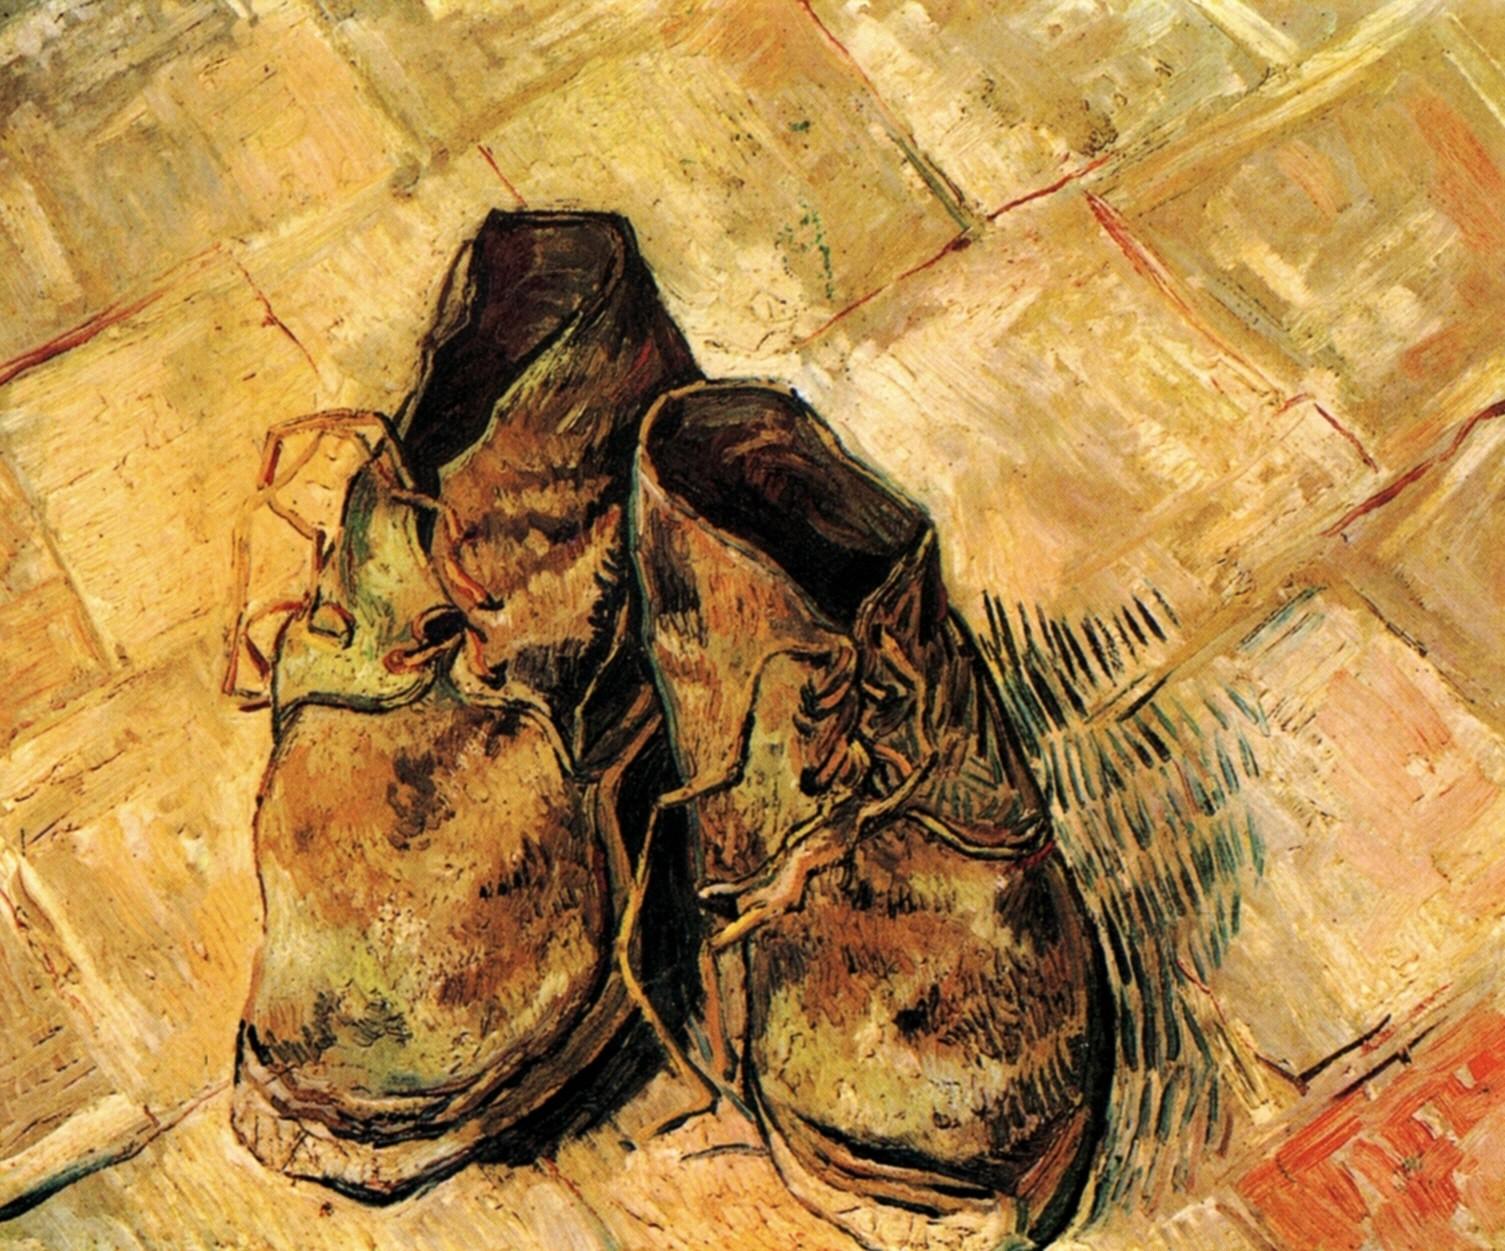 A Pair Of Shoes Van Gogh